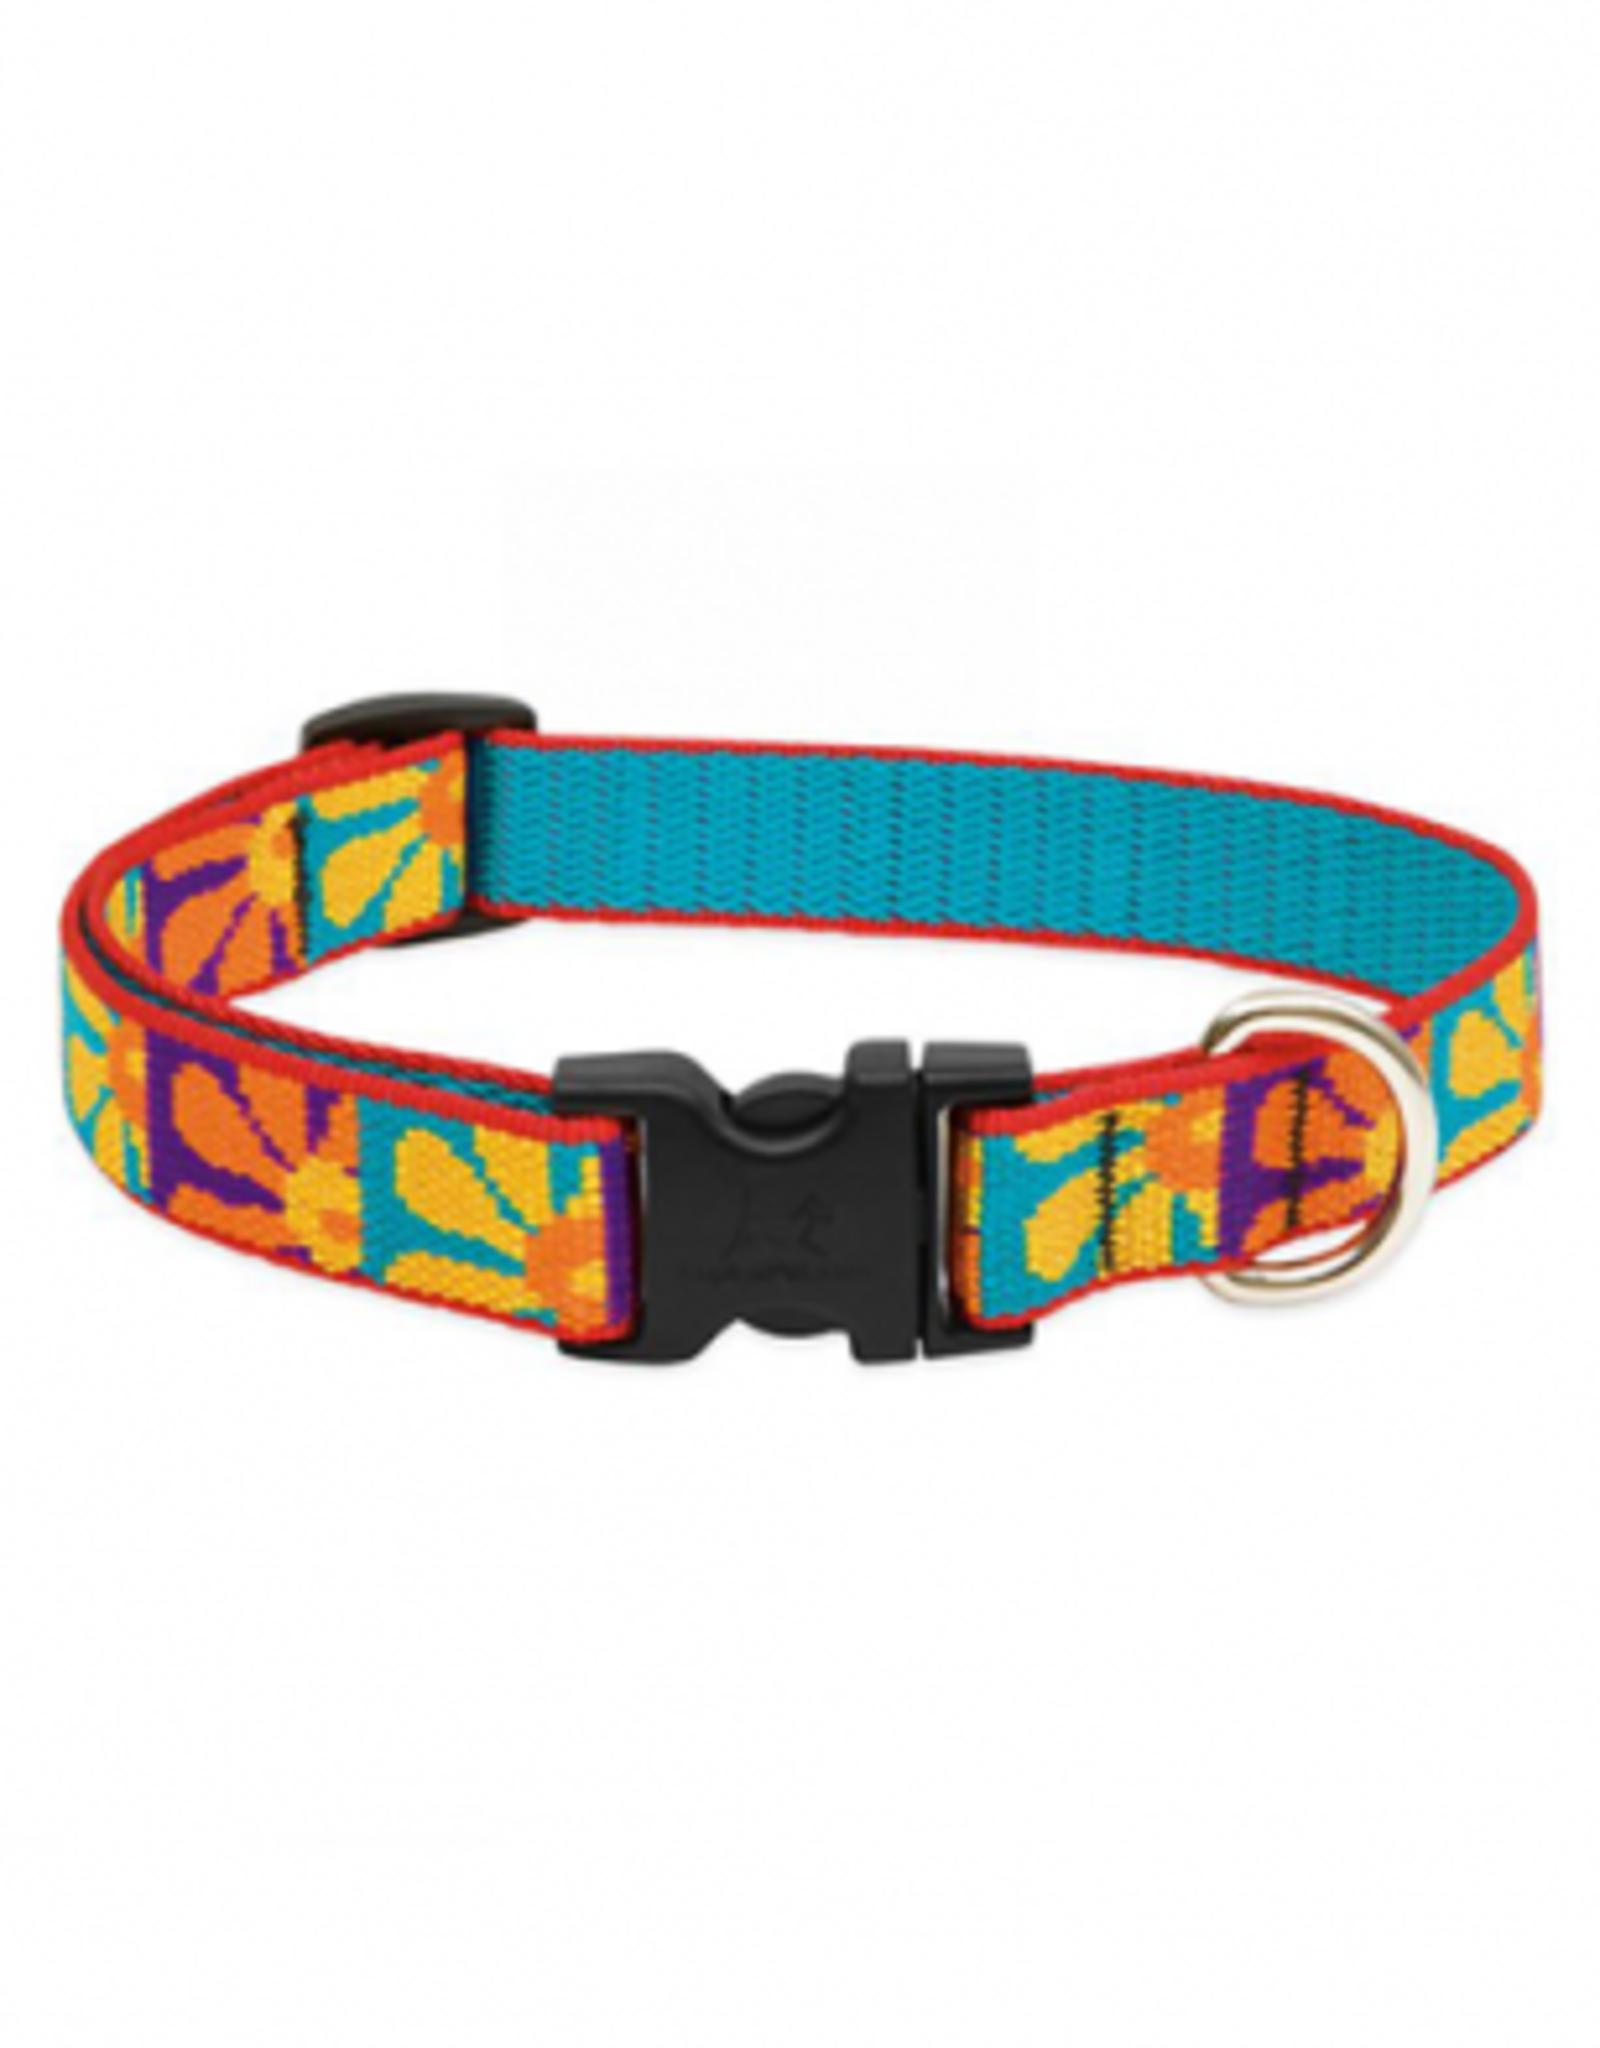 "Lupine Lupine Collar Dog Crazy Daisy 3/4"" x 9-14"""